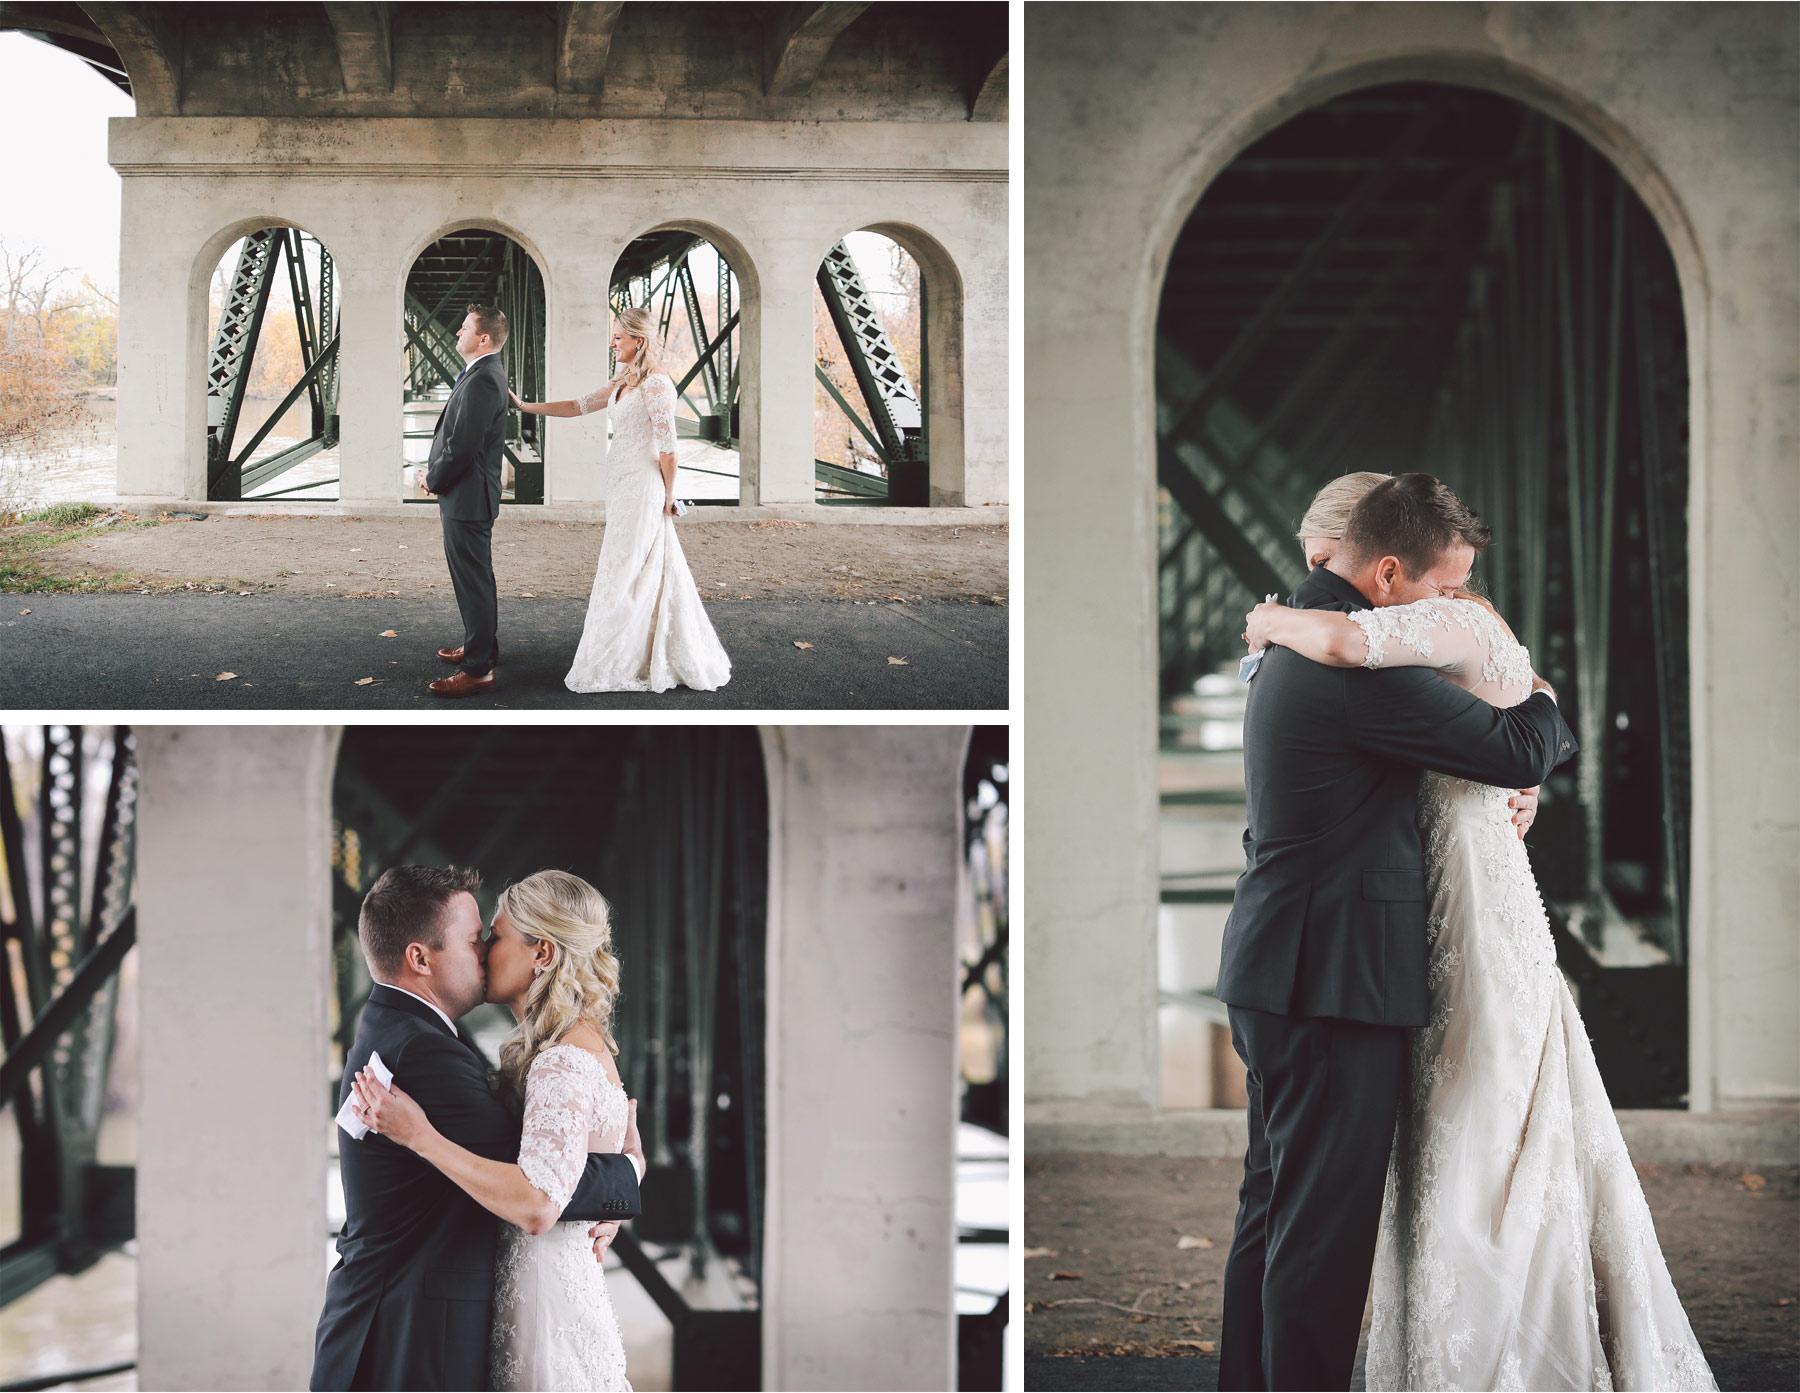 04-Shakopee-Minnesota-Wedding-Photography-by-Vick-Photography-First-Look-Bridge-Amber-and-Justin.jpg